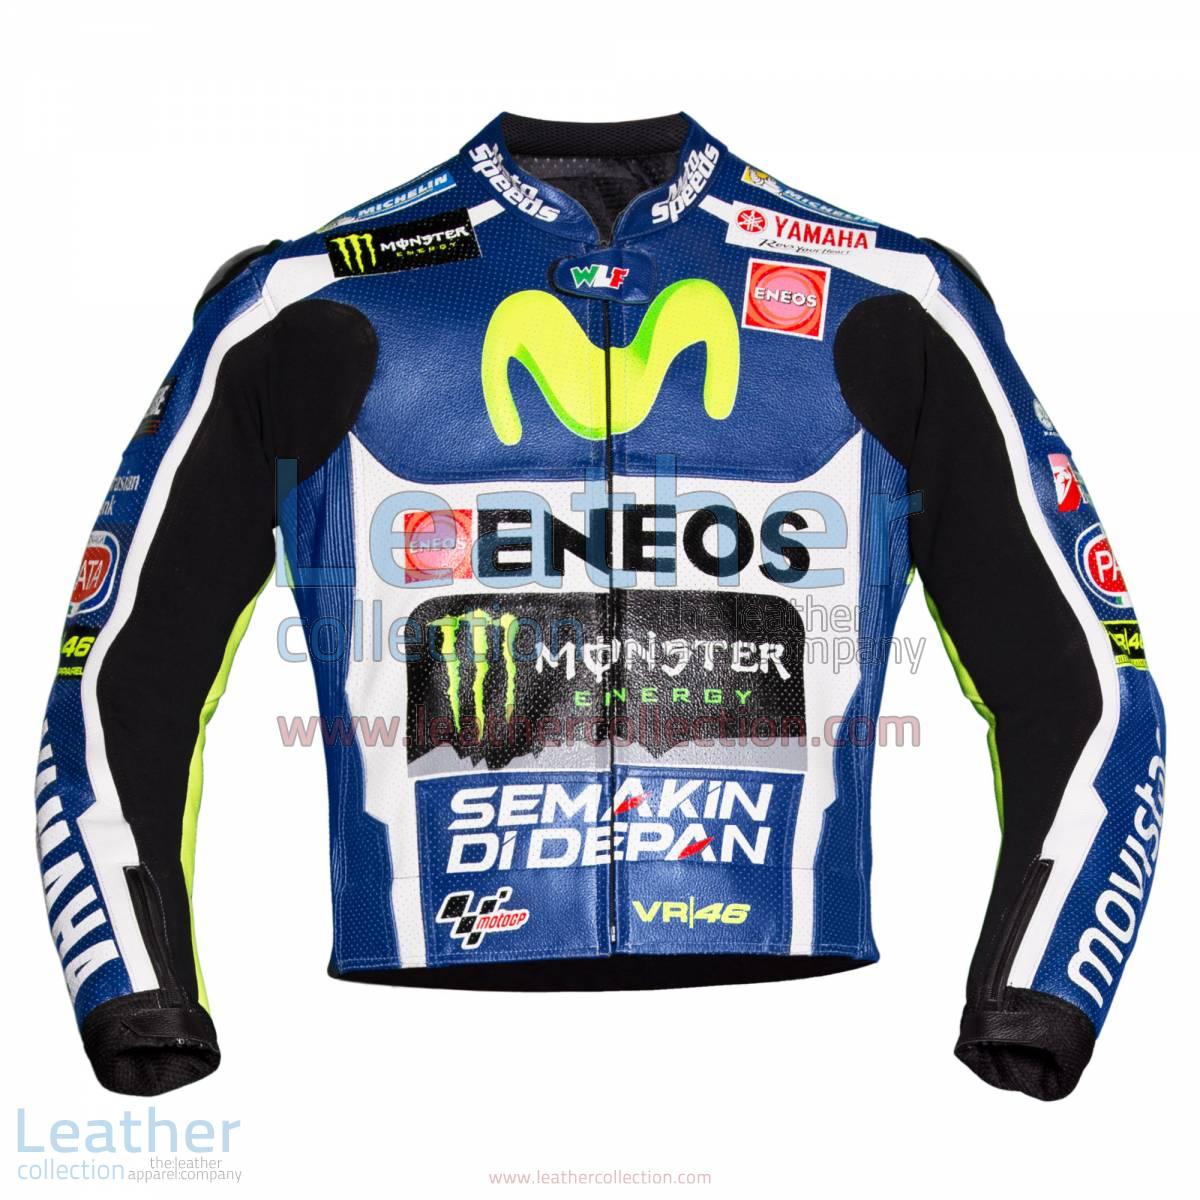 Valentino Rossi Movistar Yamaha 2016 MotoGP Race Jacket | Valentino Rossi Movistar Yamaha 2016 MotoGP Race Jacket